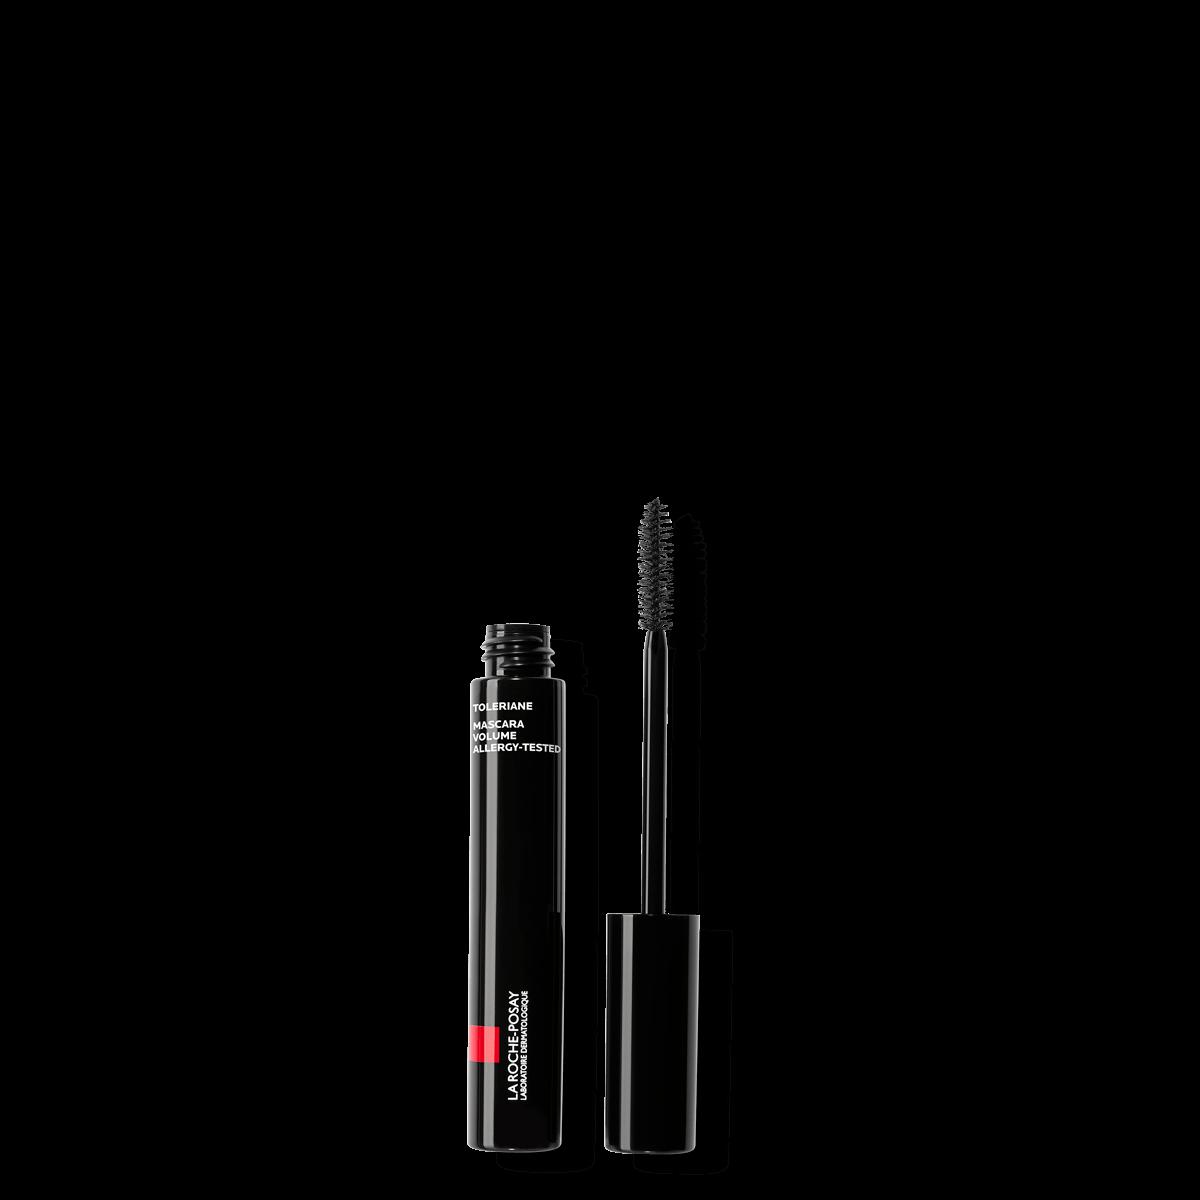 La Roche Posay Sensitive Toleriane Make up VOLUME_MASCARA Brown 333787